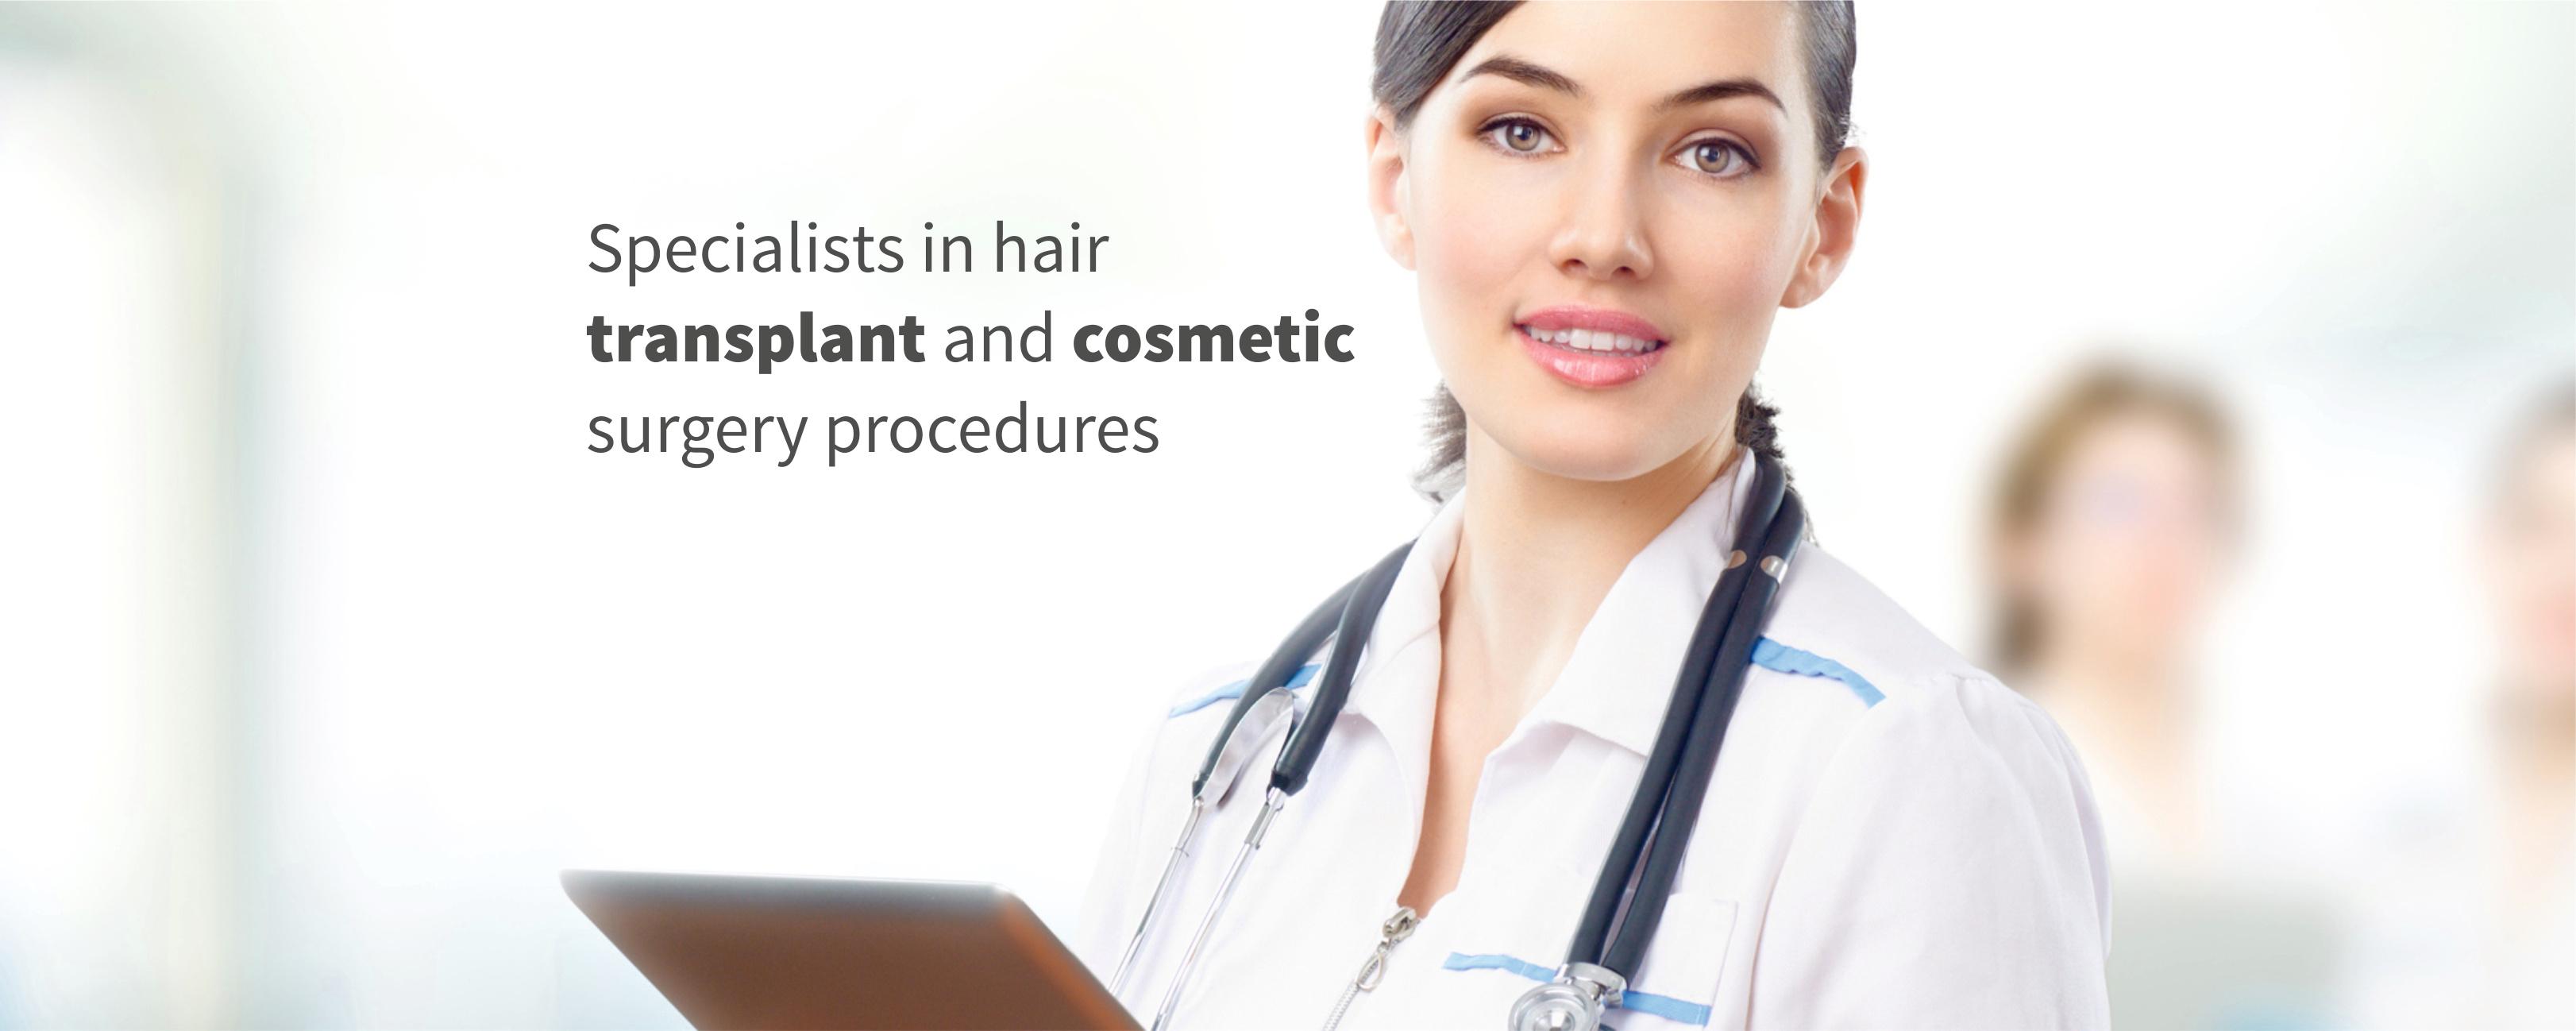 Specialists in Medicine